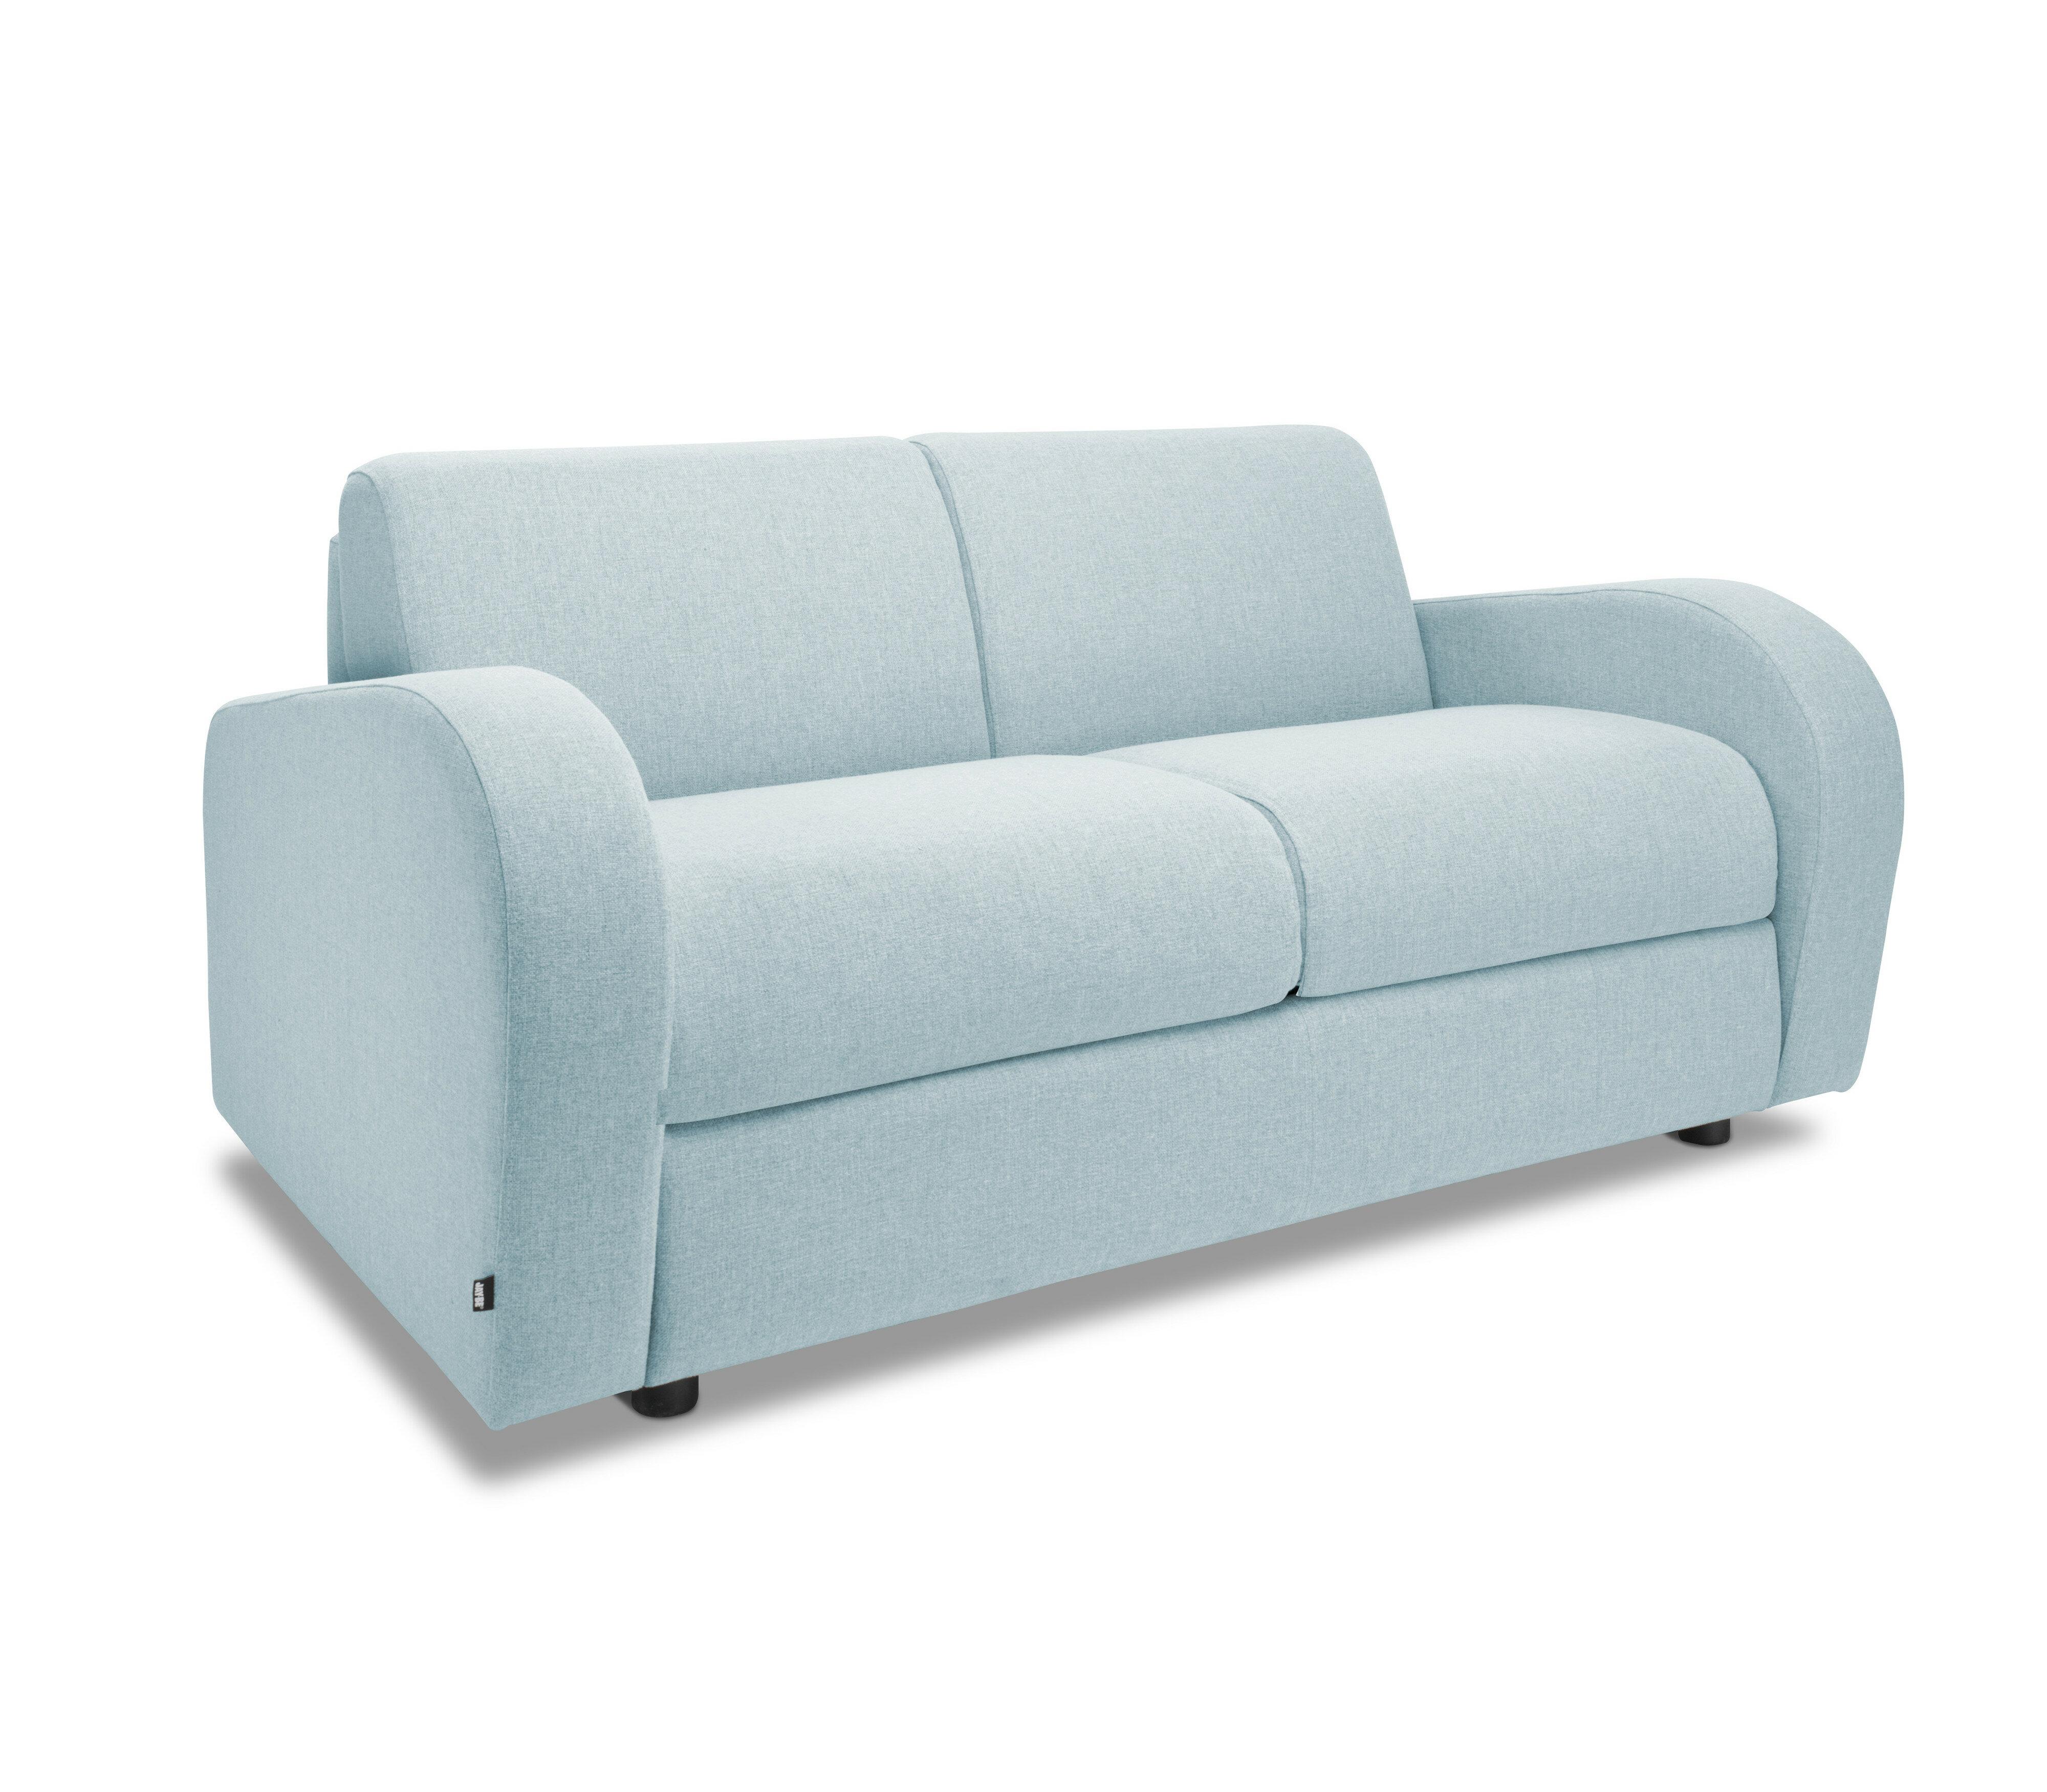 Jay-Be Retro 2 Seater Sofa Bed | Wayfair.co.uk